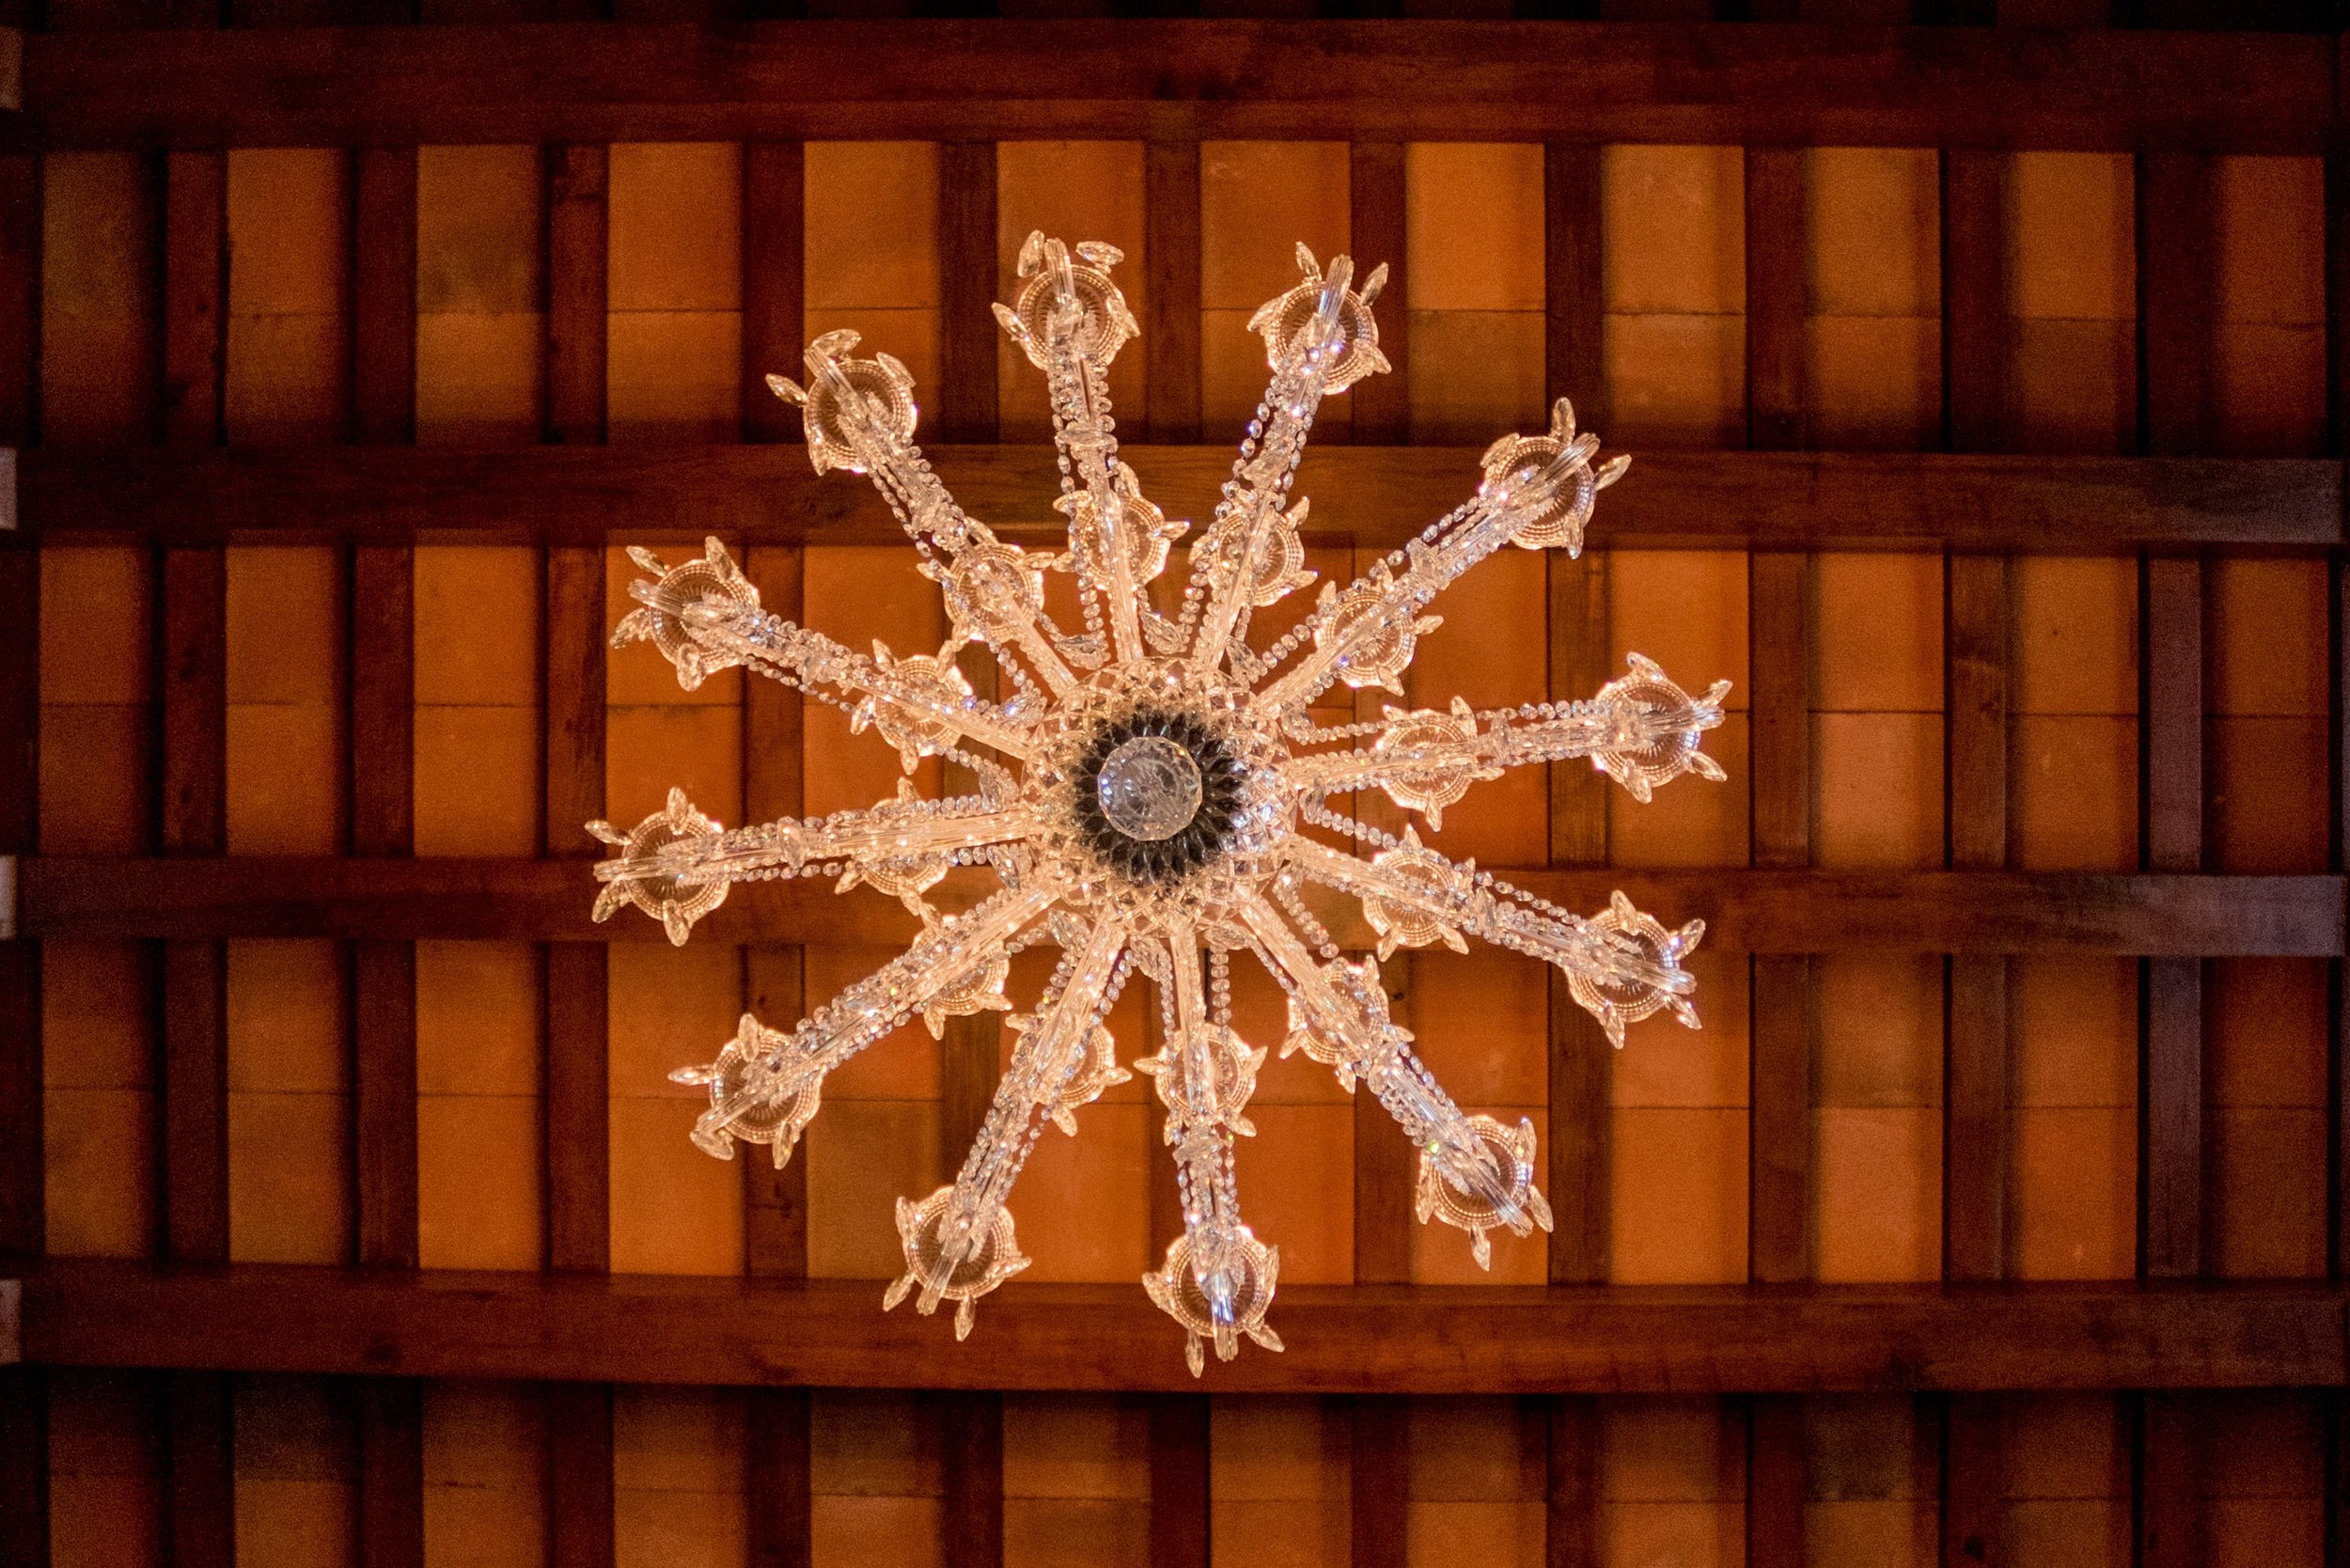 Diamant 24 in interior (2)-min.jpeg